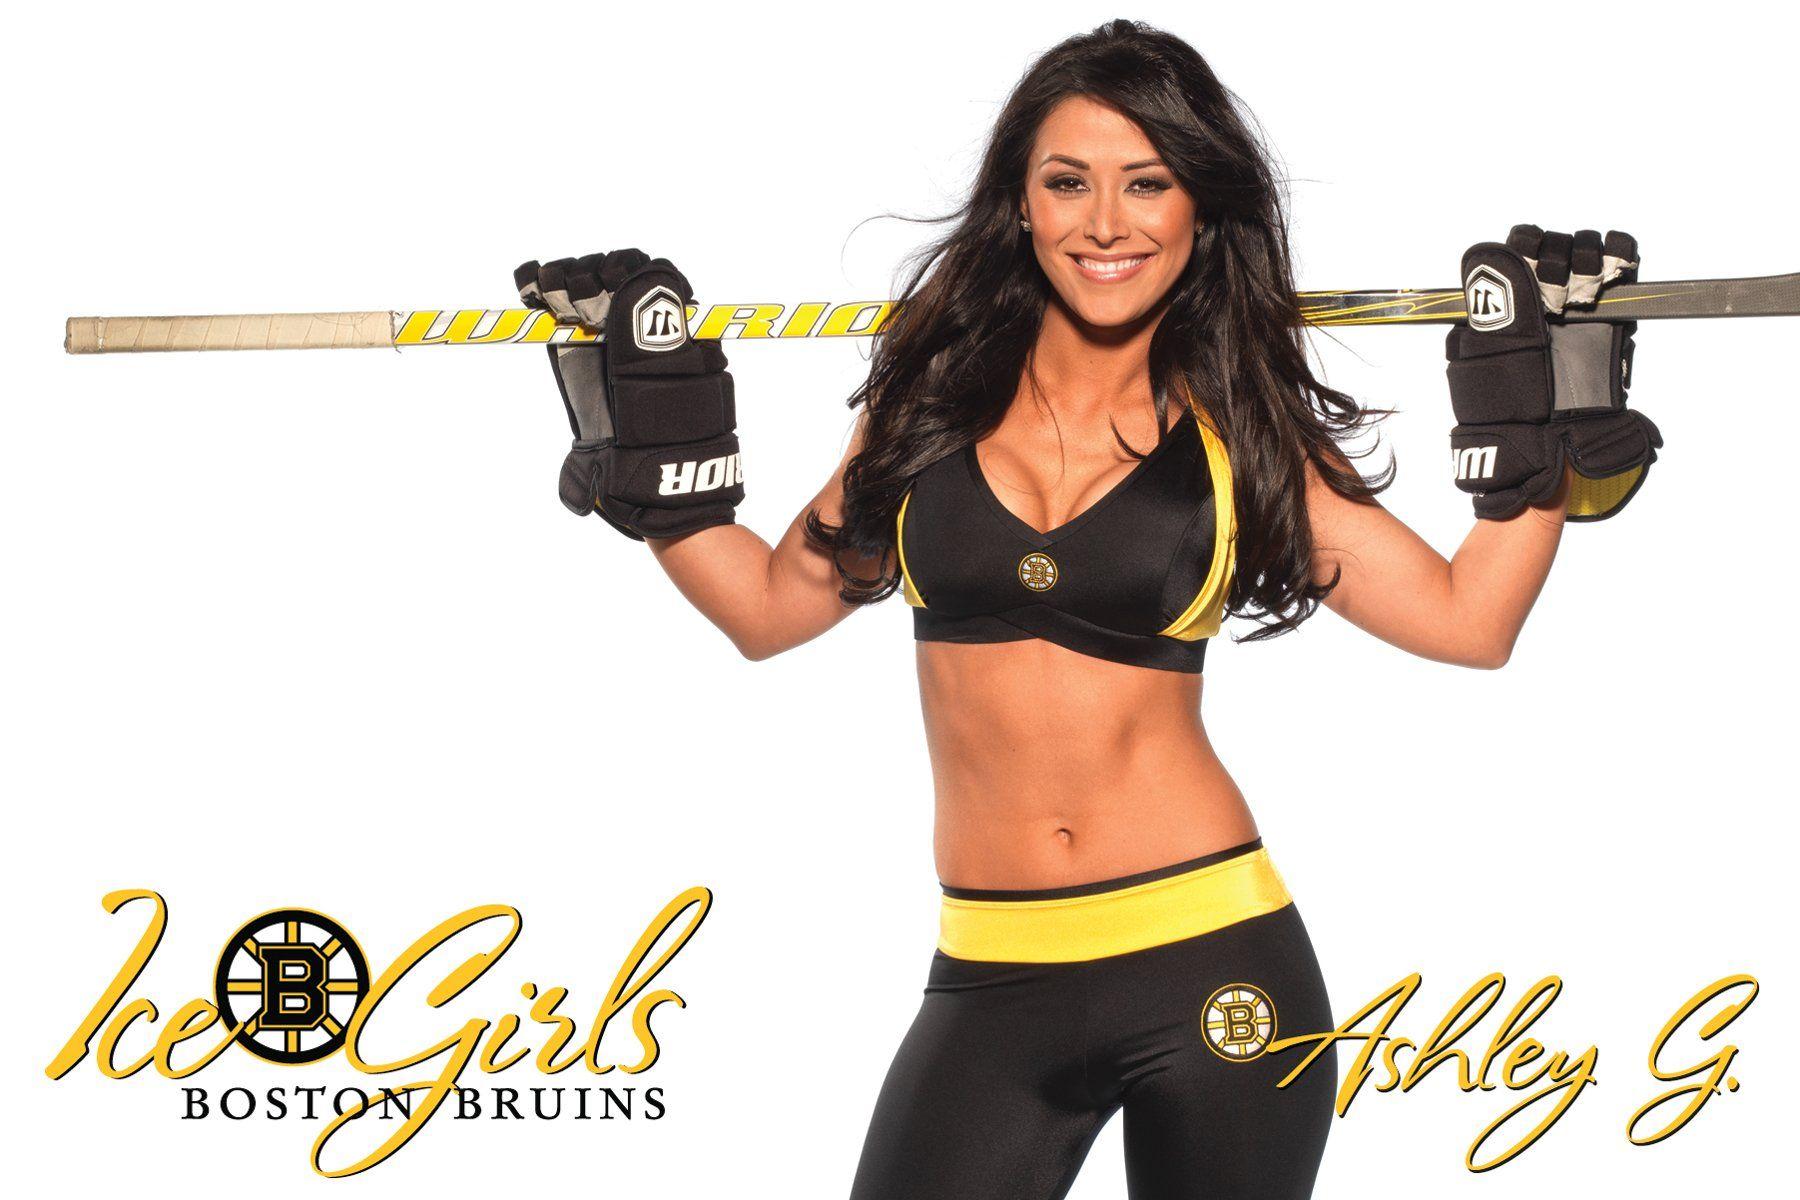 Boston Bruins Wallpaper Stanley Cup Boston Bruins Stanley Cup 799